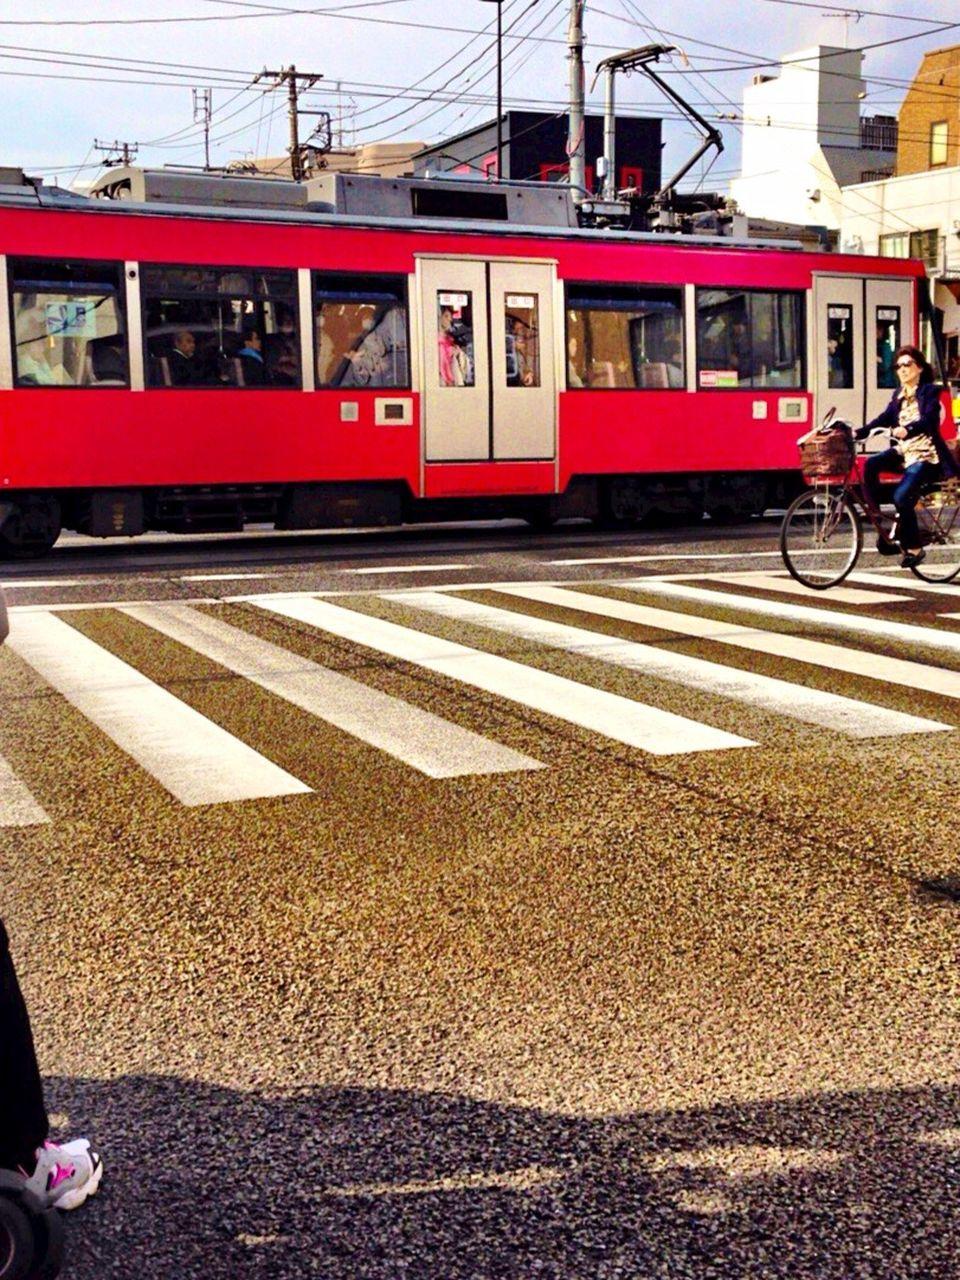 transportation, mode of transport, public transportation, men, real people, day, train - vehicle, outdoors, women, city, sky, people